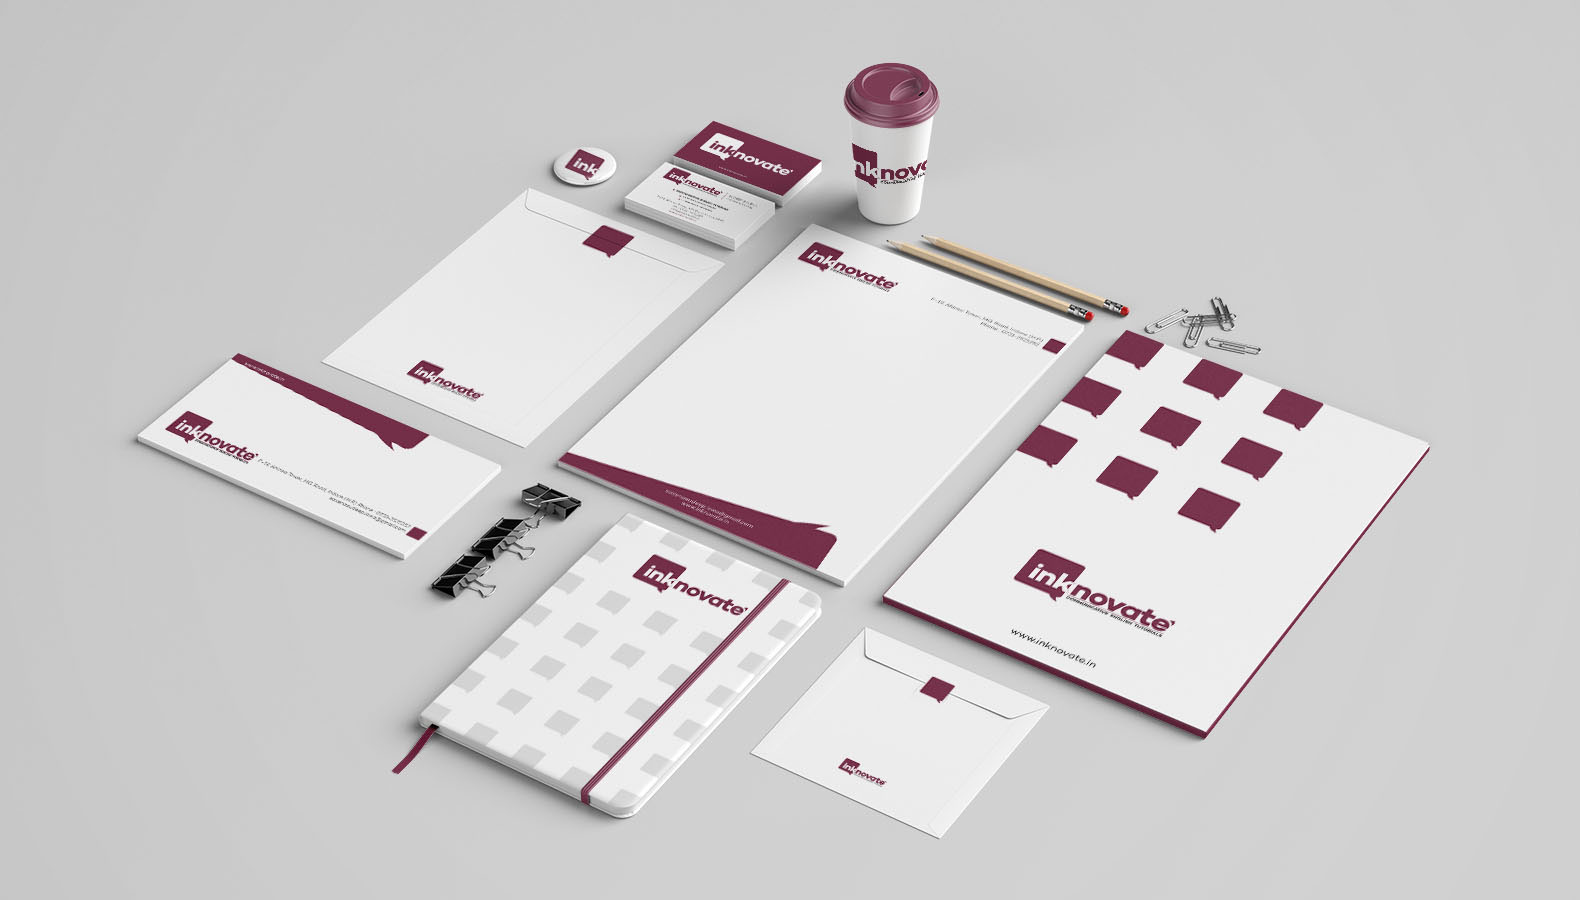 CB Patel - Social Media Graphic Designs